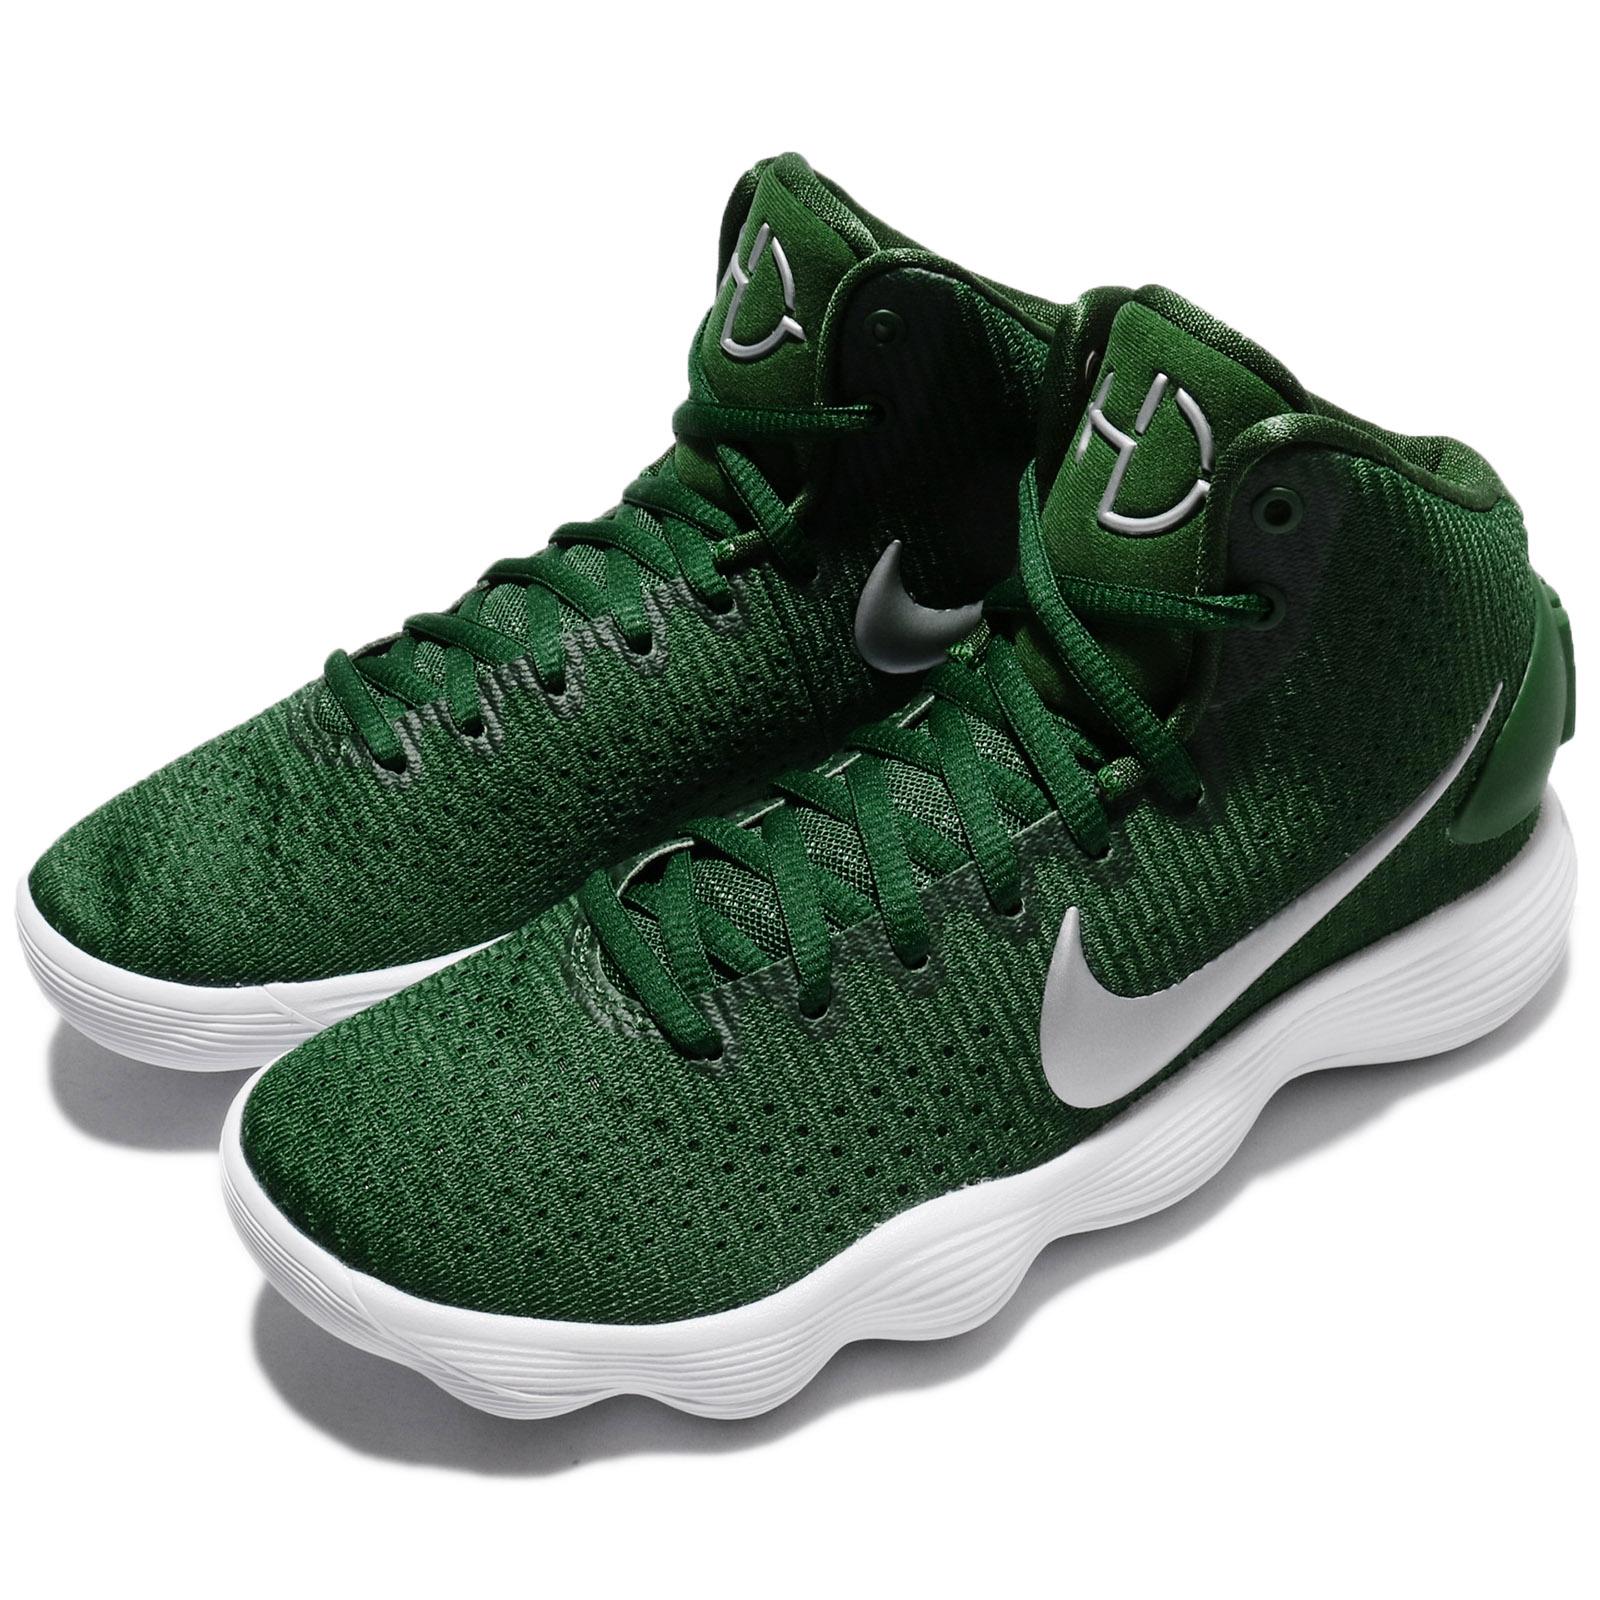 Nike 籃球鞋 Hyperdunk 2017 女鞋 897813-300